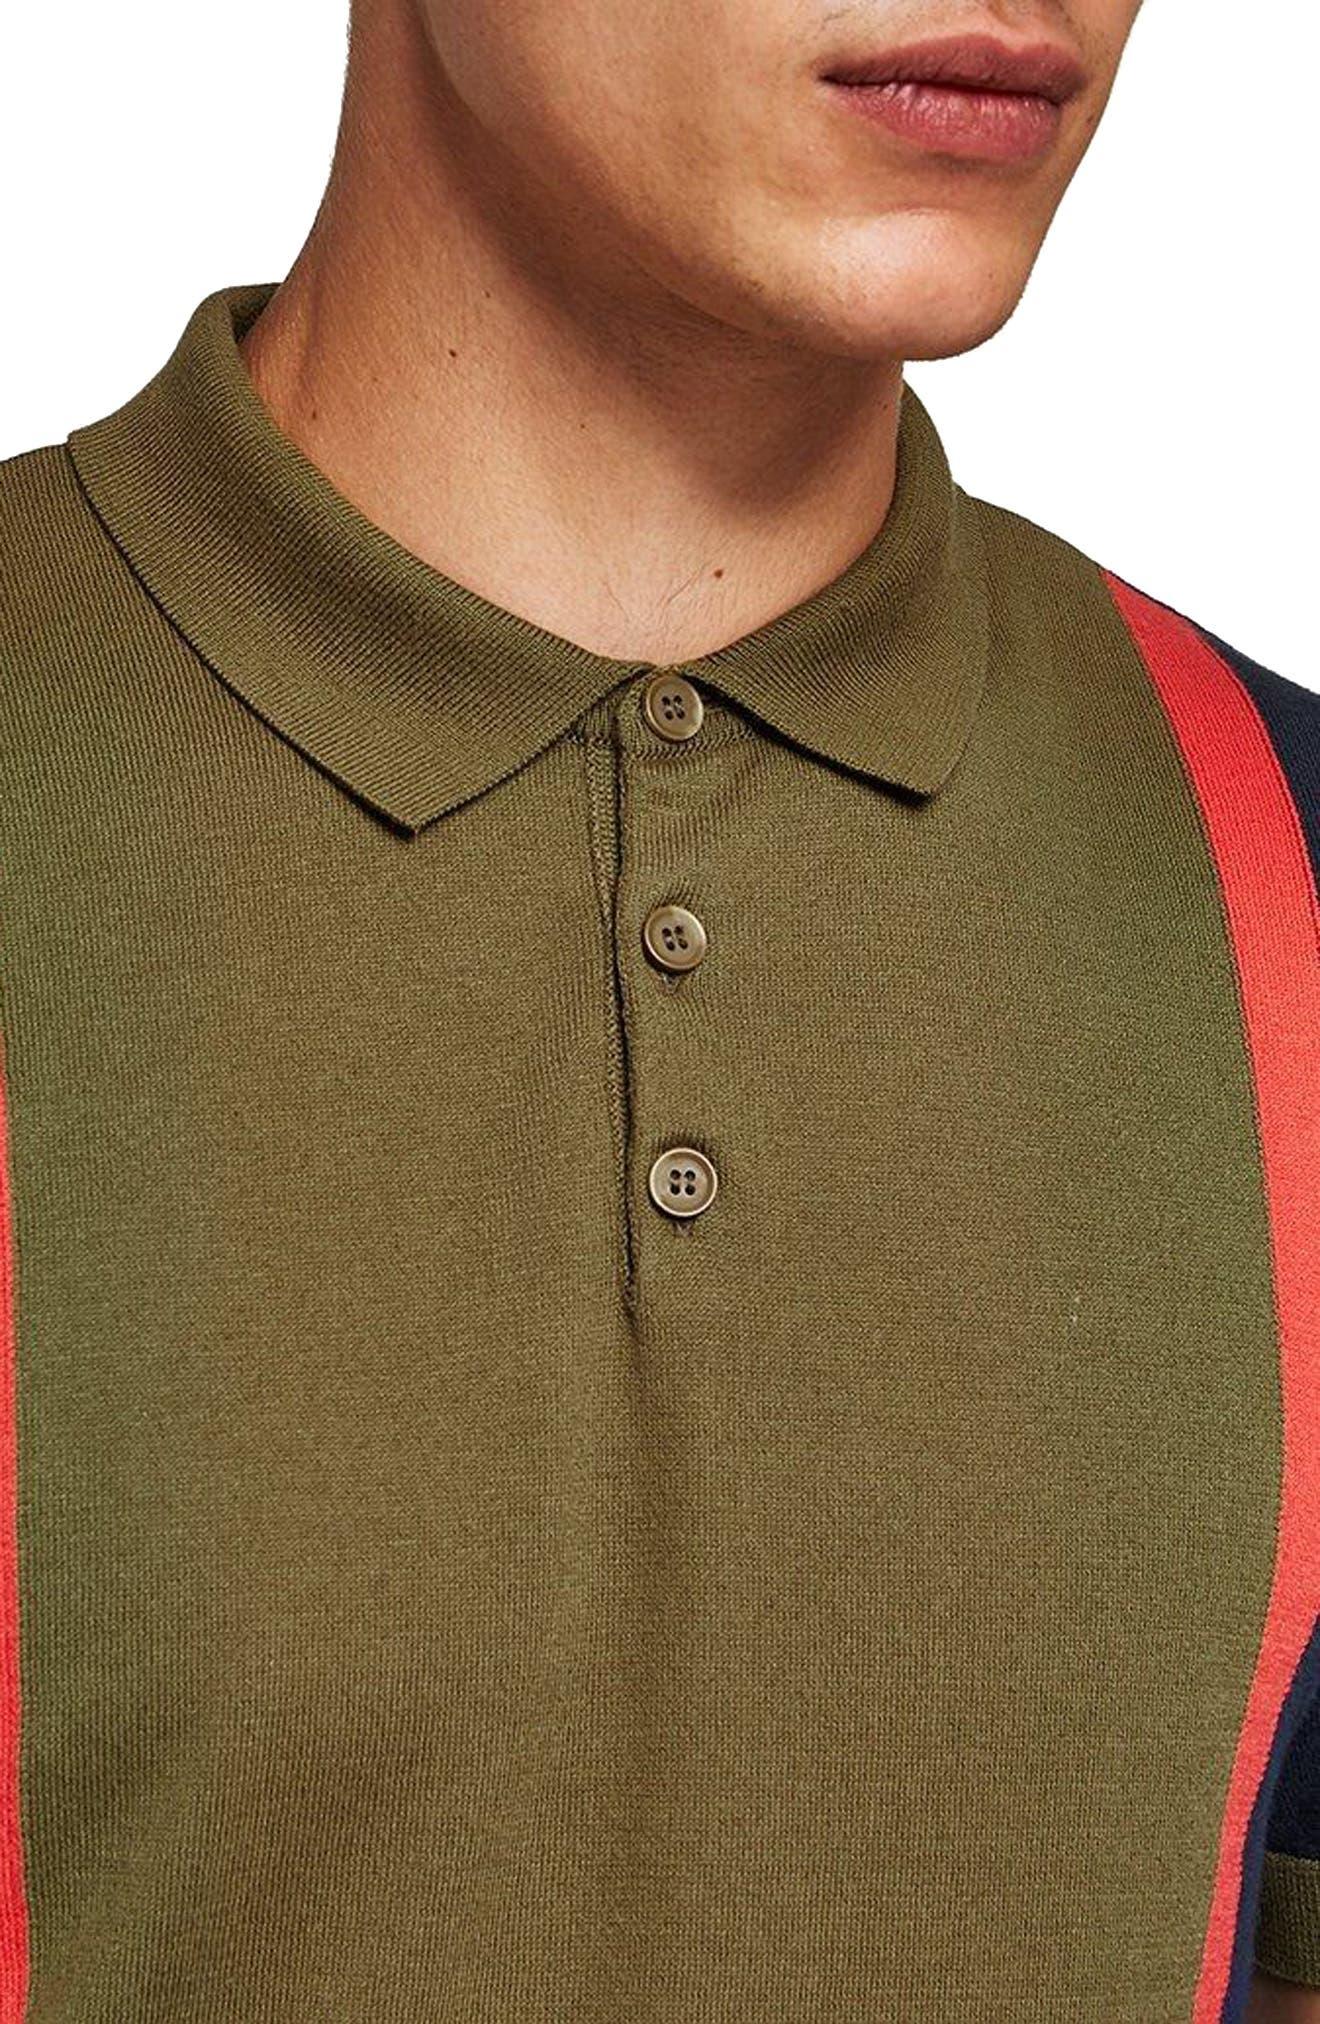 TOPMAN,                             Colorblock Classic Fit Polo,                             Alternate thumbnail 3, color,                             300